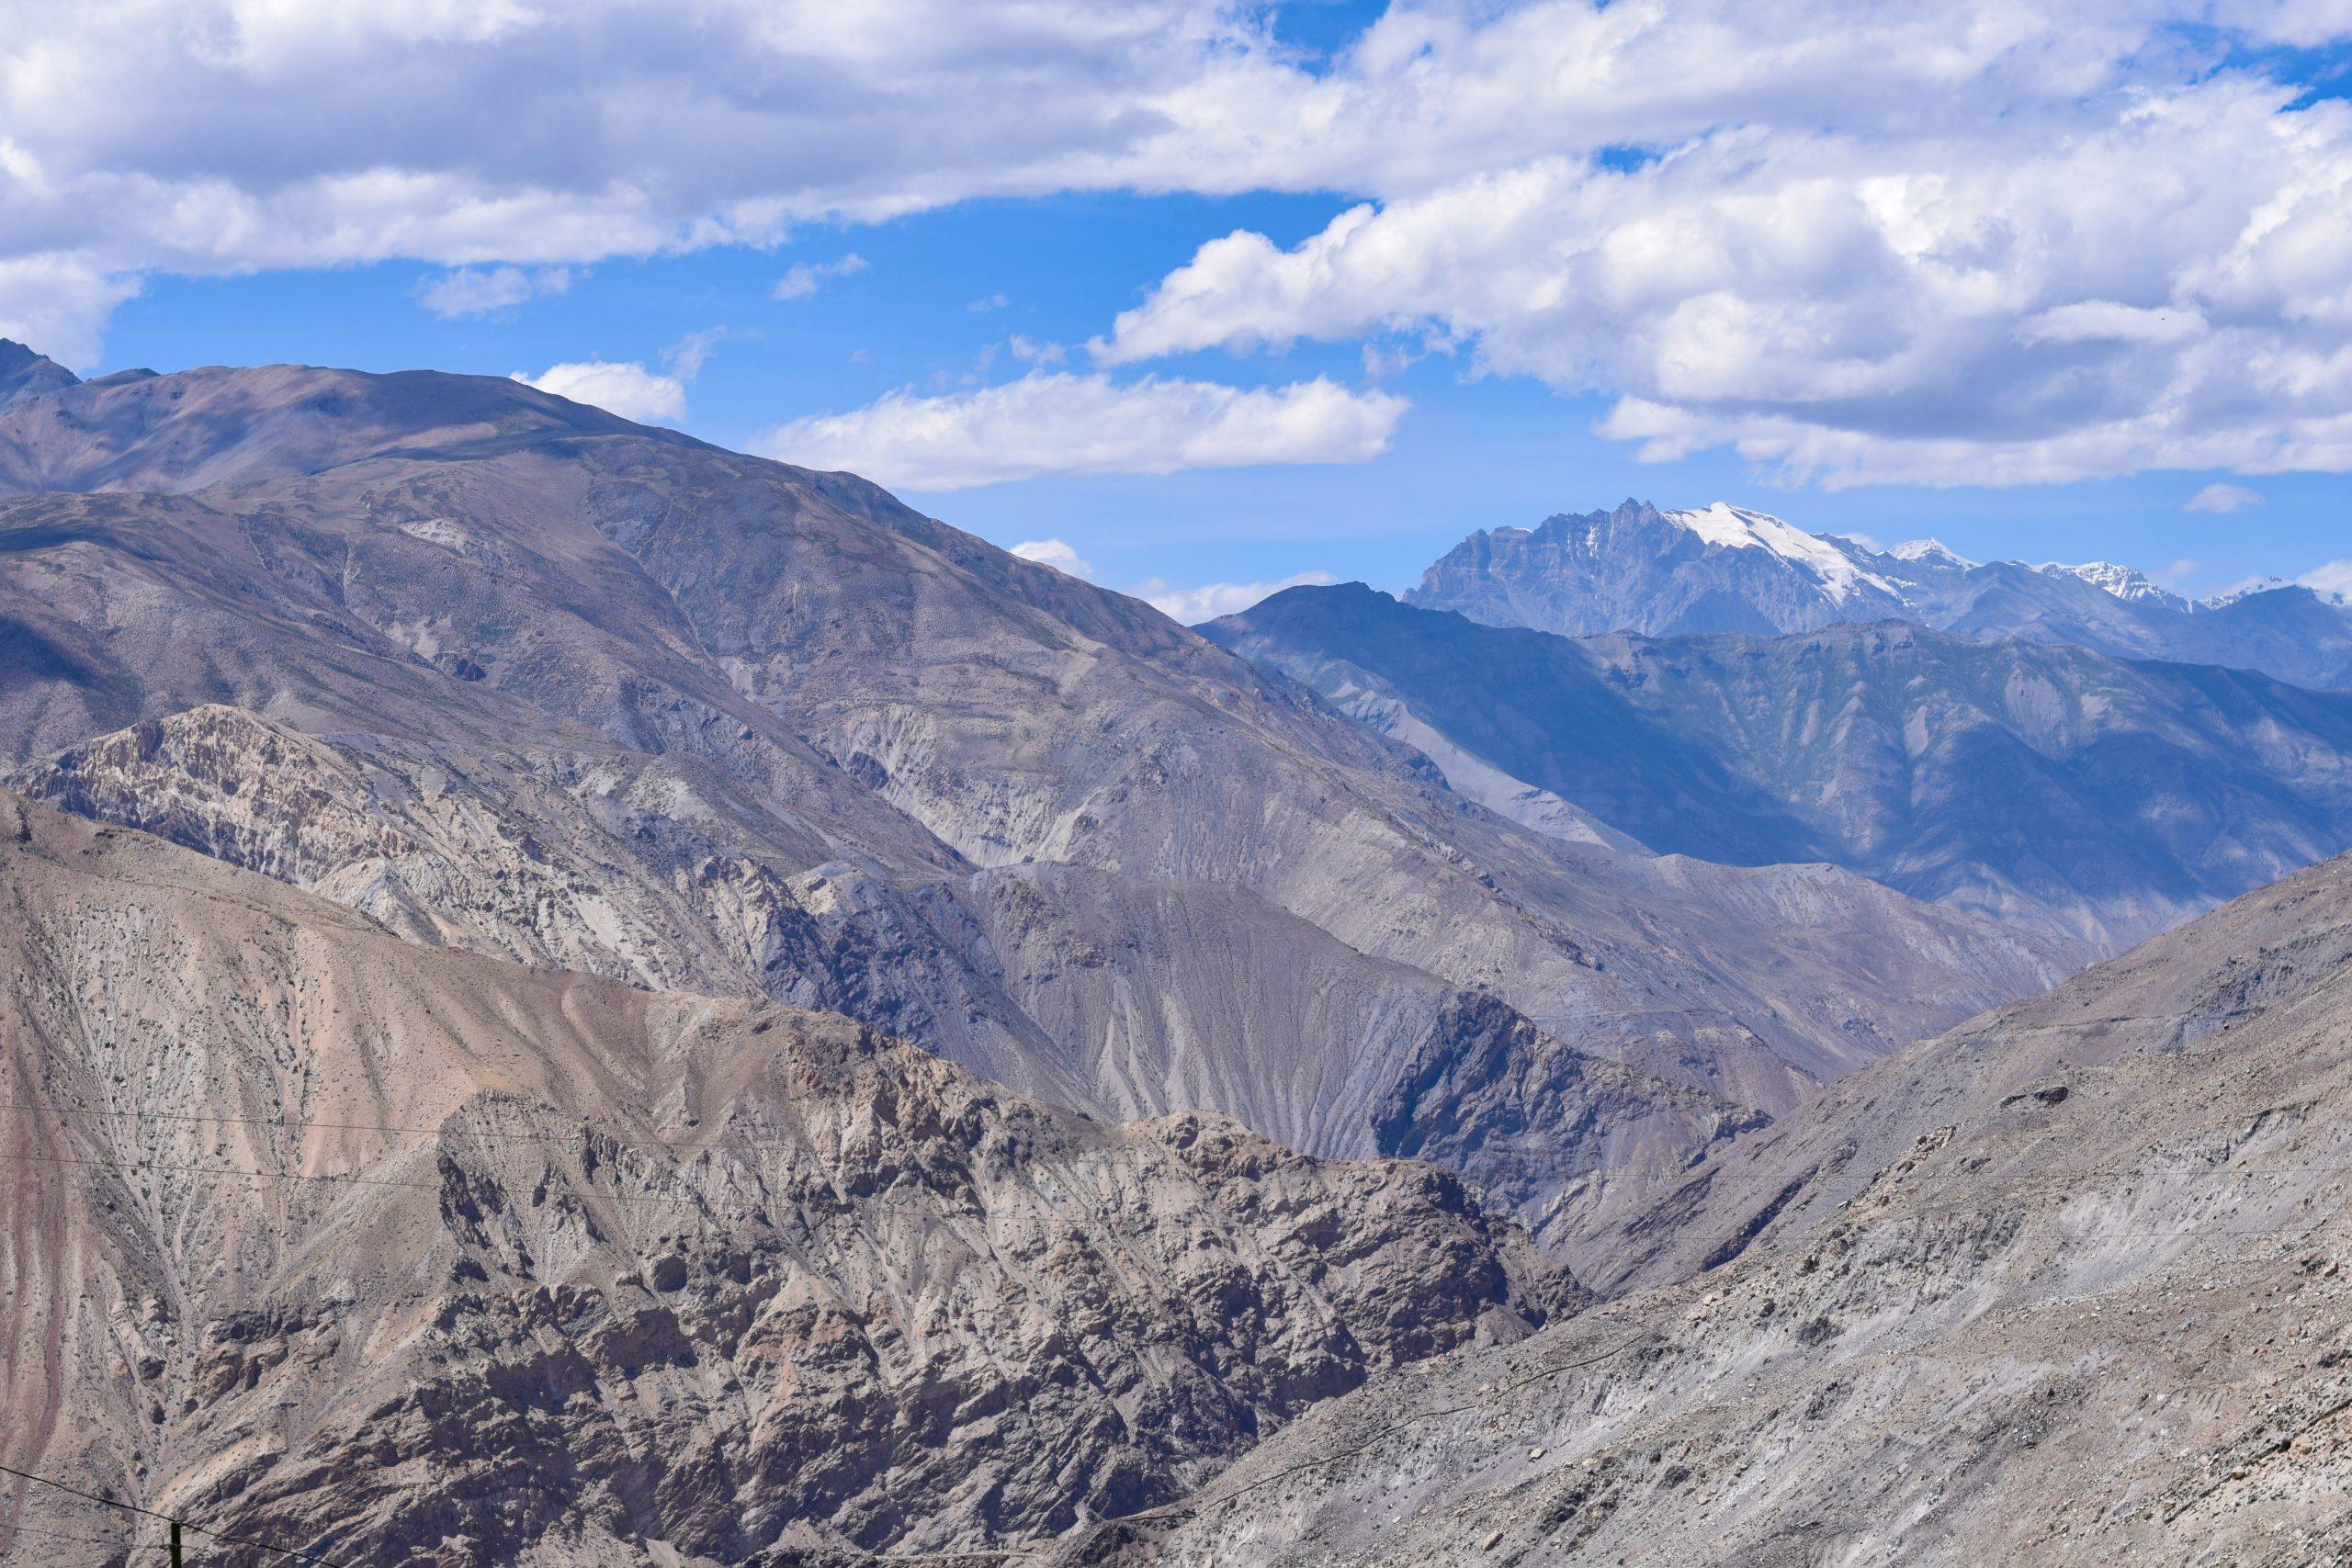 Barren mountains of Kinnaur